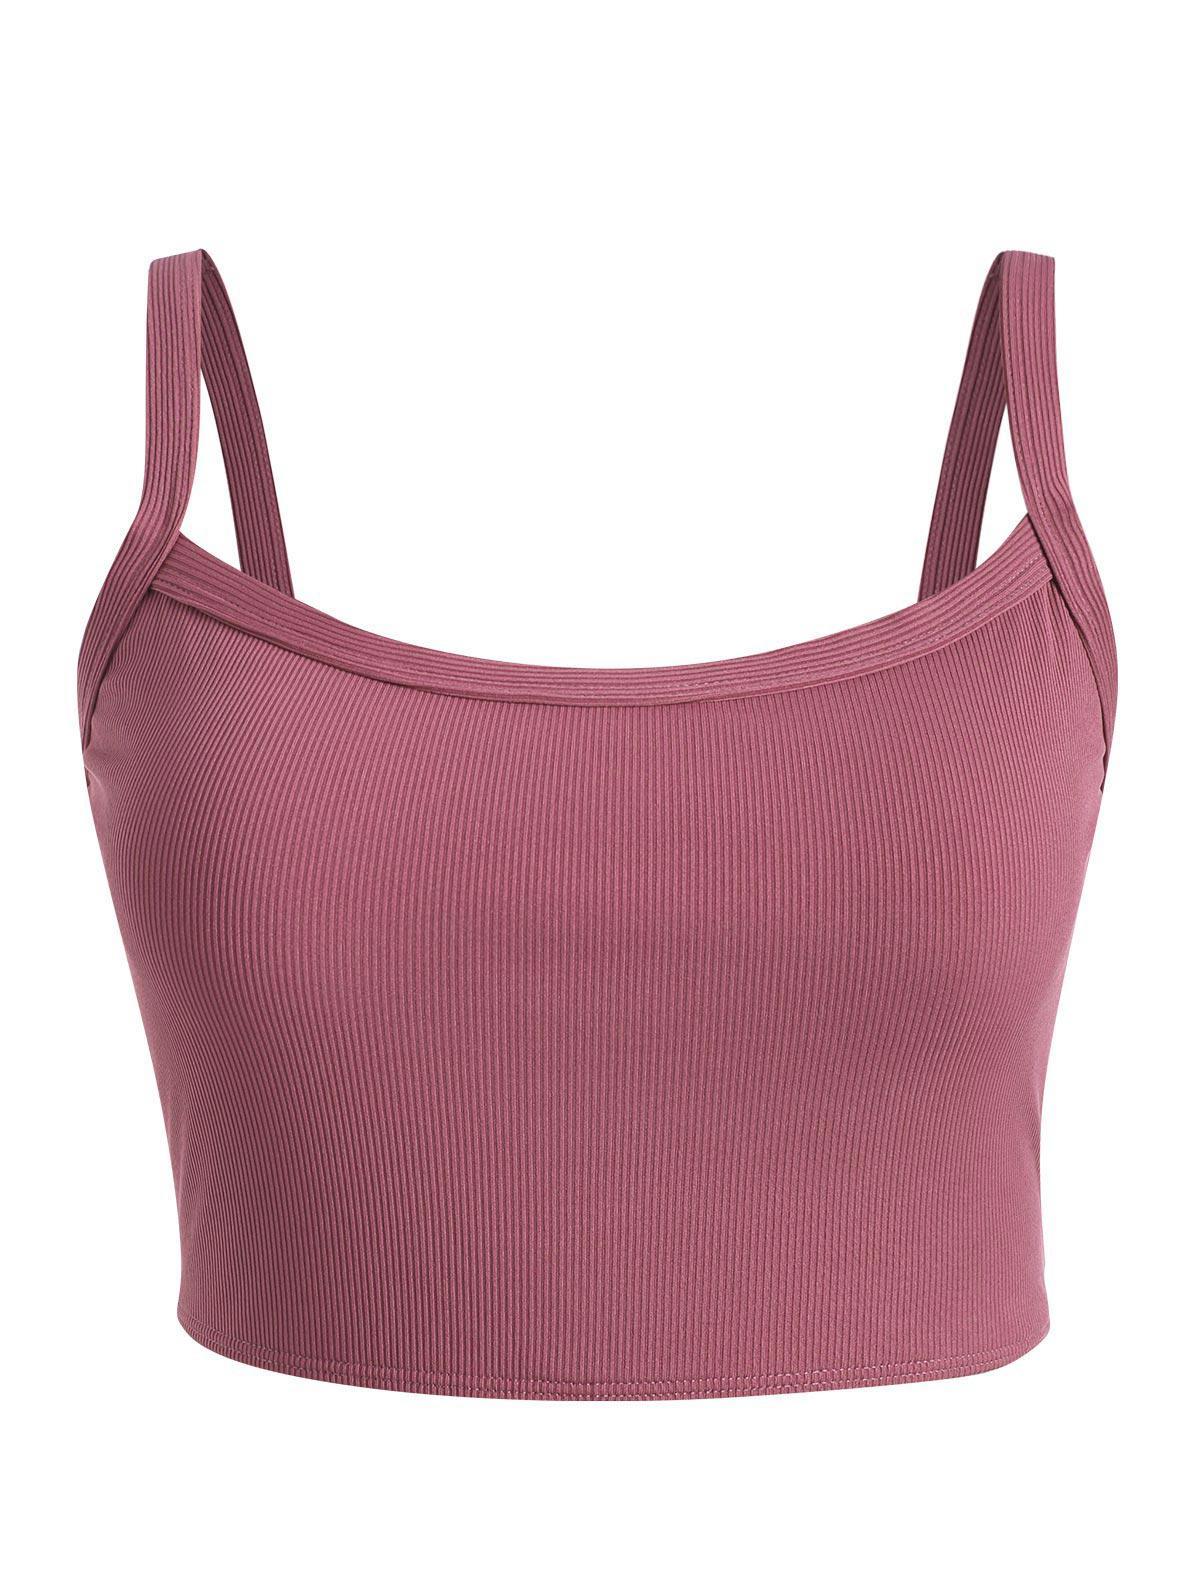 ZAFUL Plus Size Basic Ribbed Bikini Top